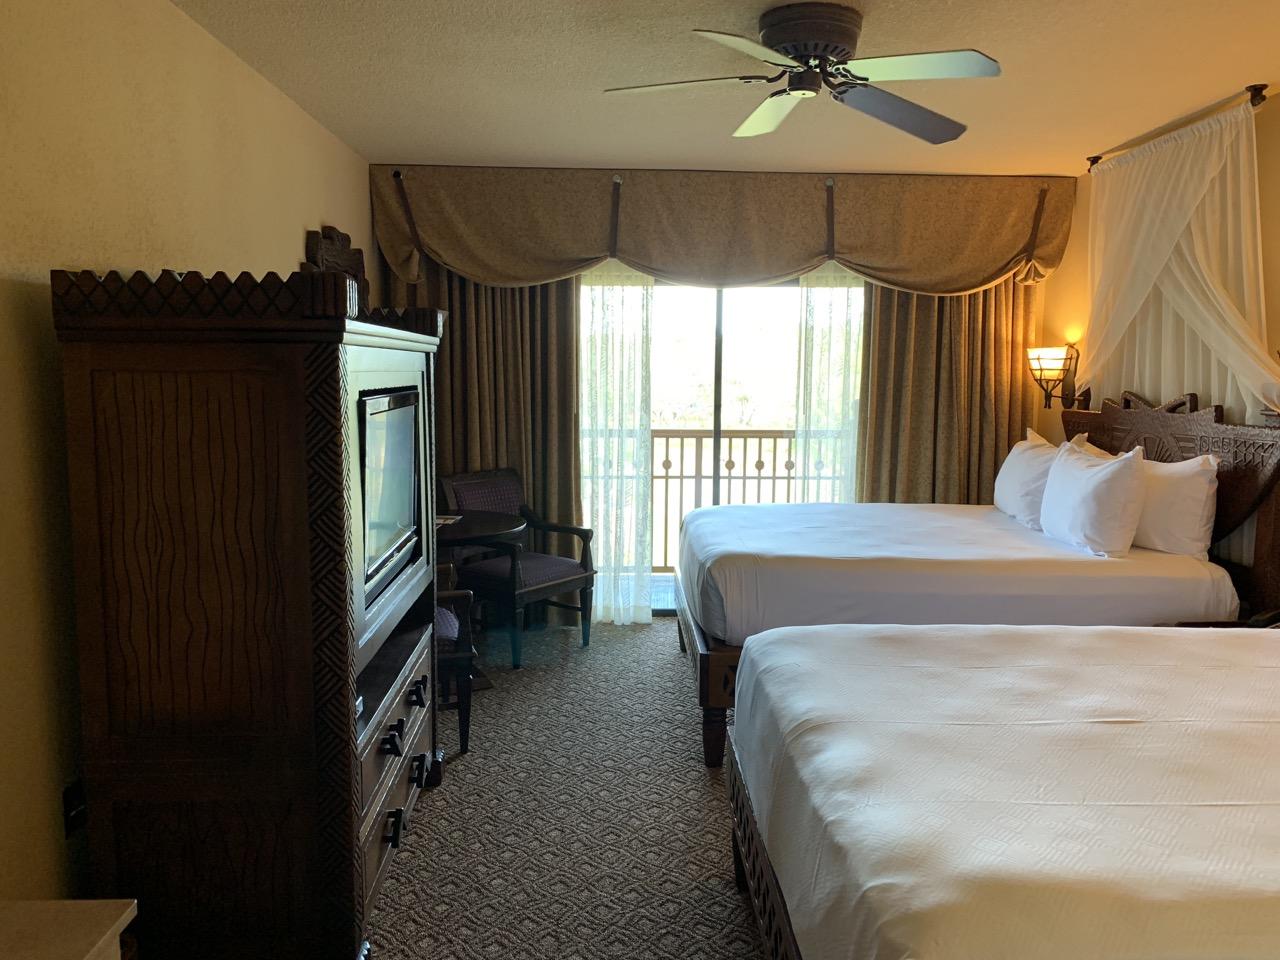 disney world best deluxe resort hotel ranking 03 animal kingdom lodge room.jpeg